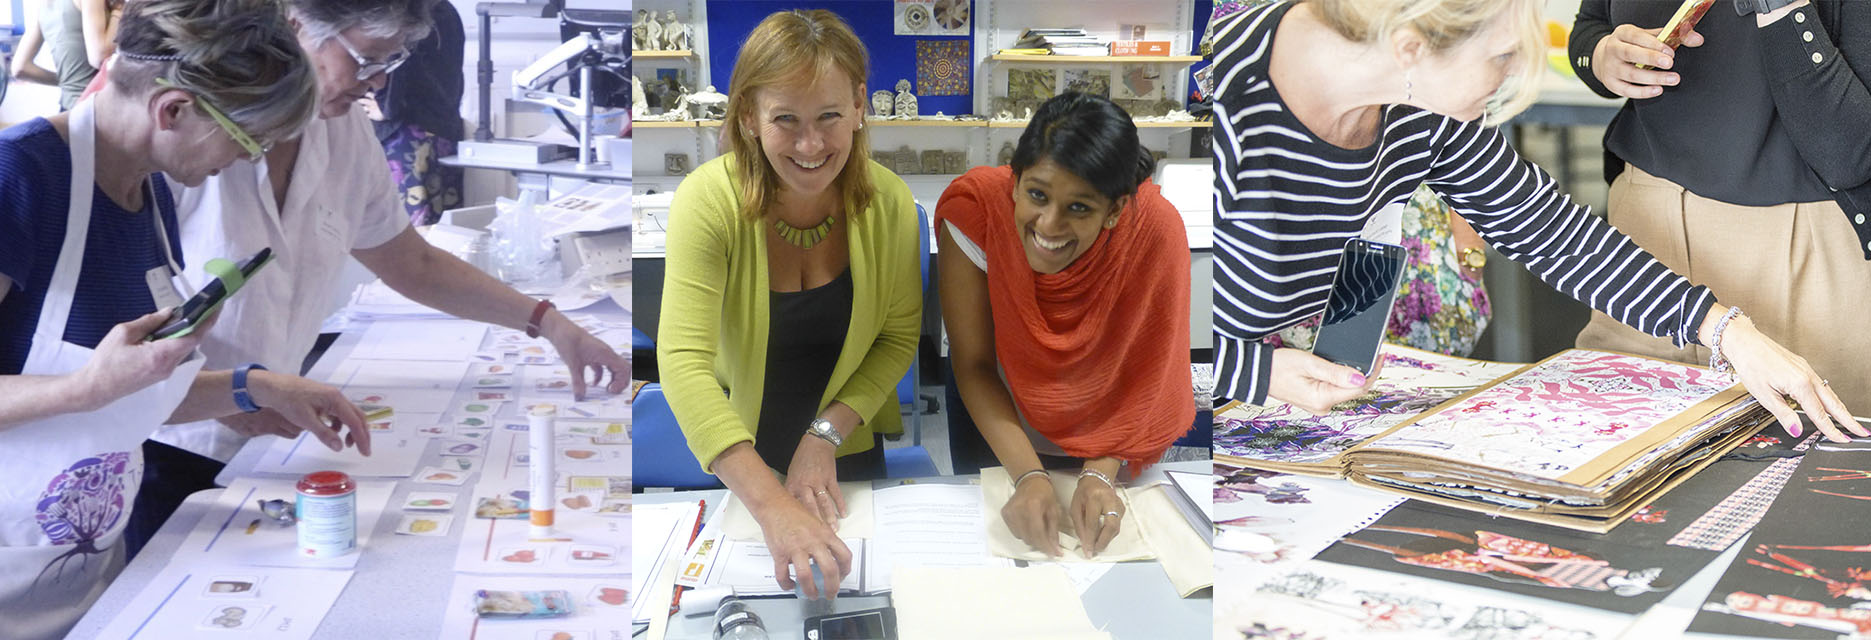 Textiles & Food Teachers Event image